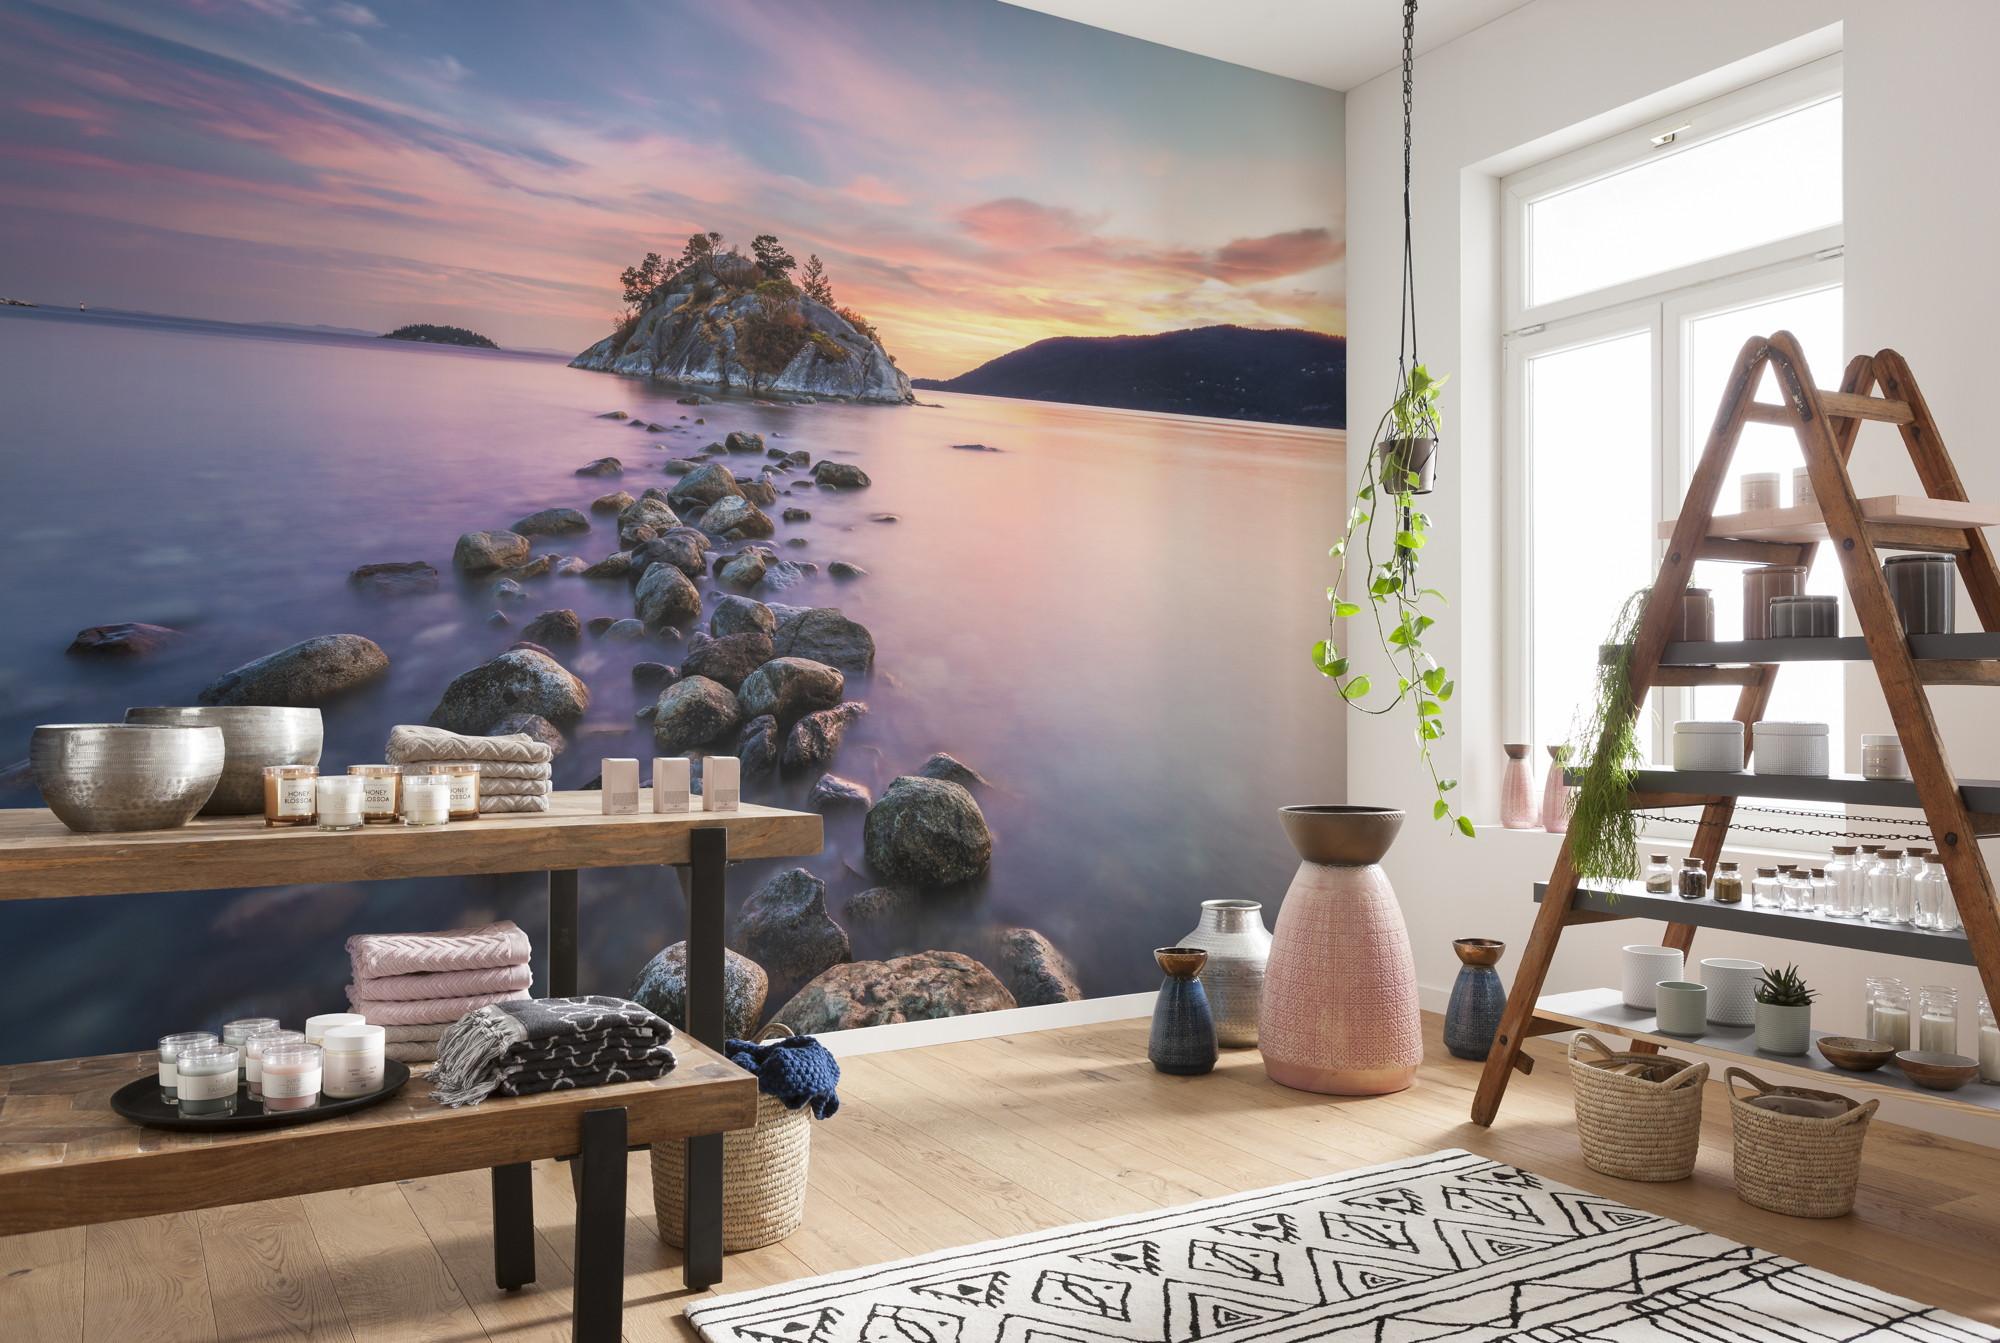 fototapete whytecliff 8 534 von komar national. Black Bedroom Furniture Sets. Home Design Ideas